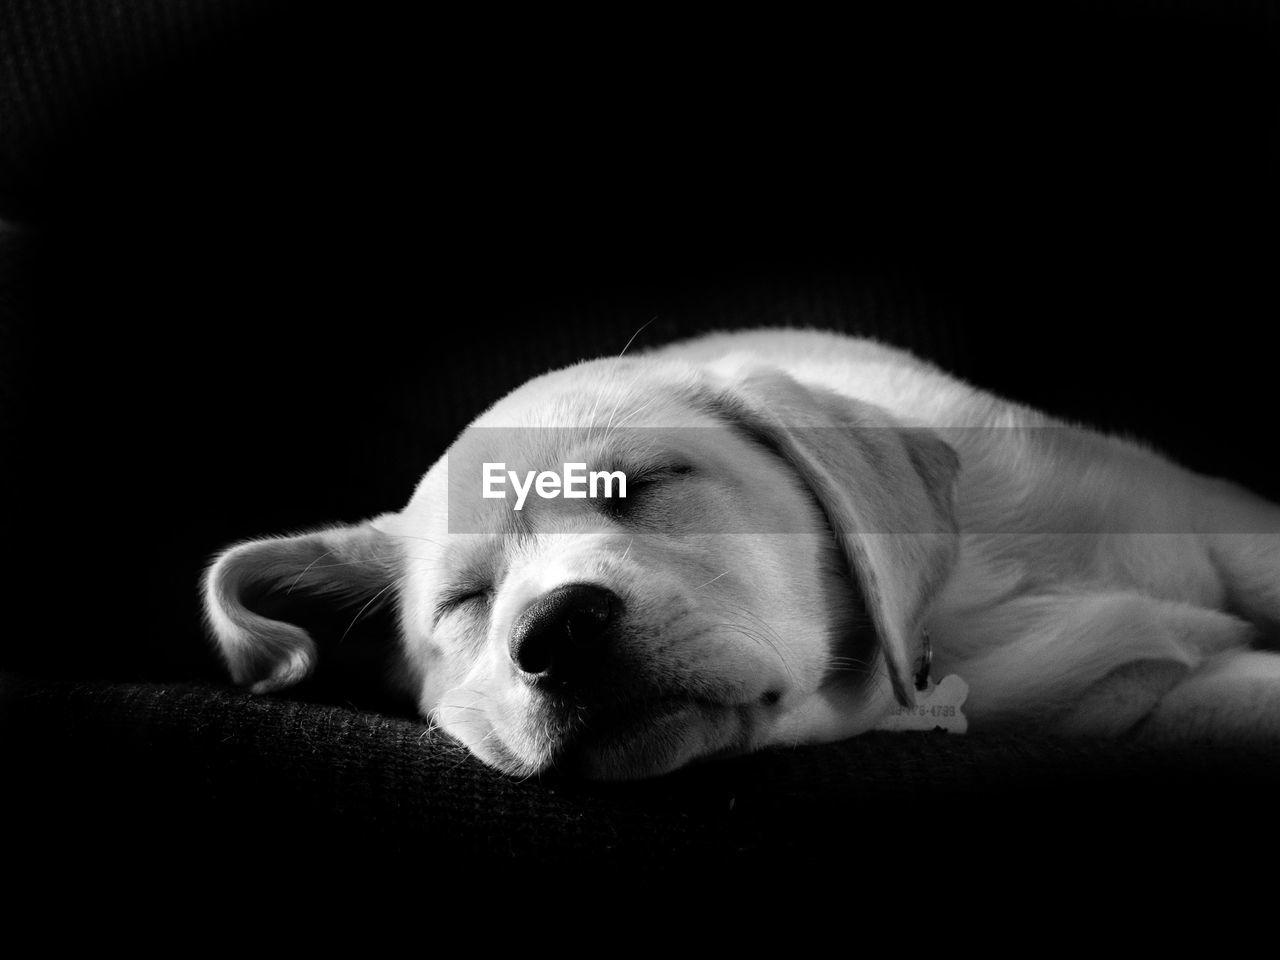 CLOSE-UP OF A DOG SLEEPING ON CARPET